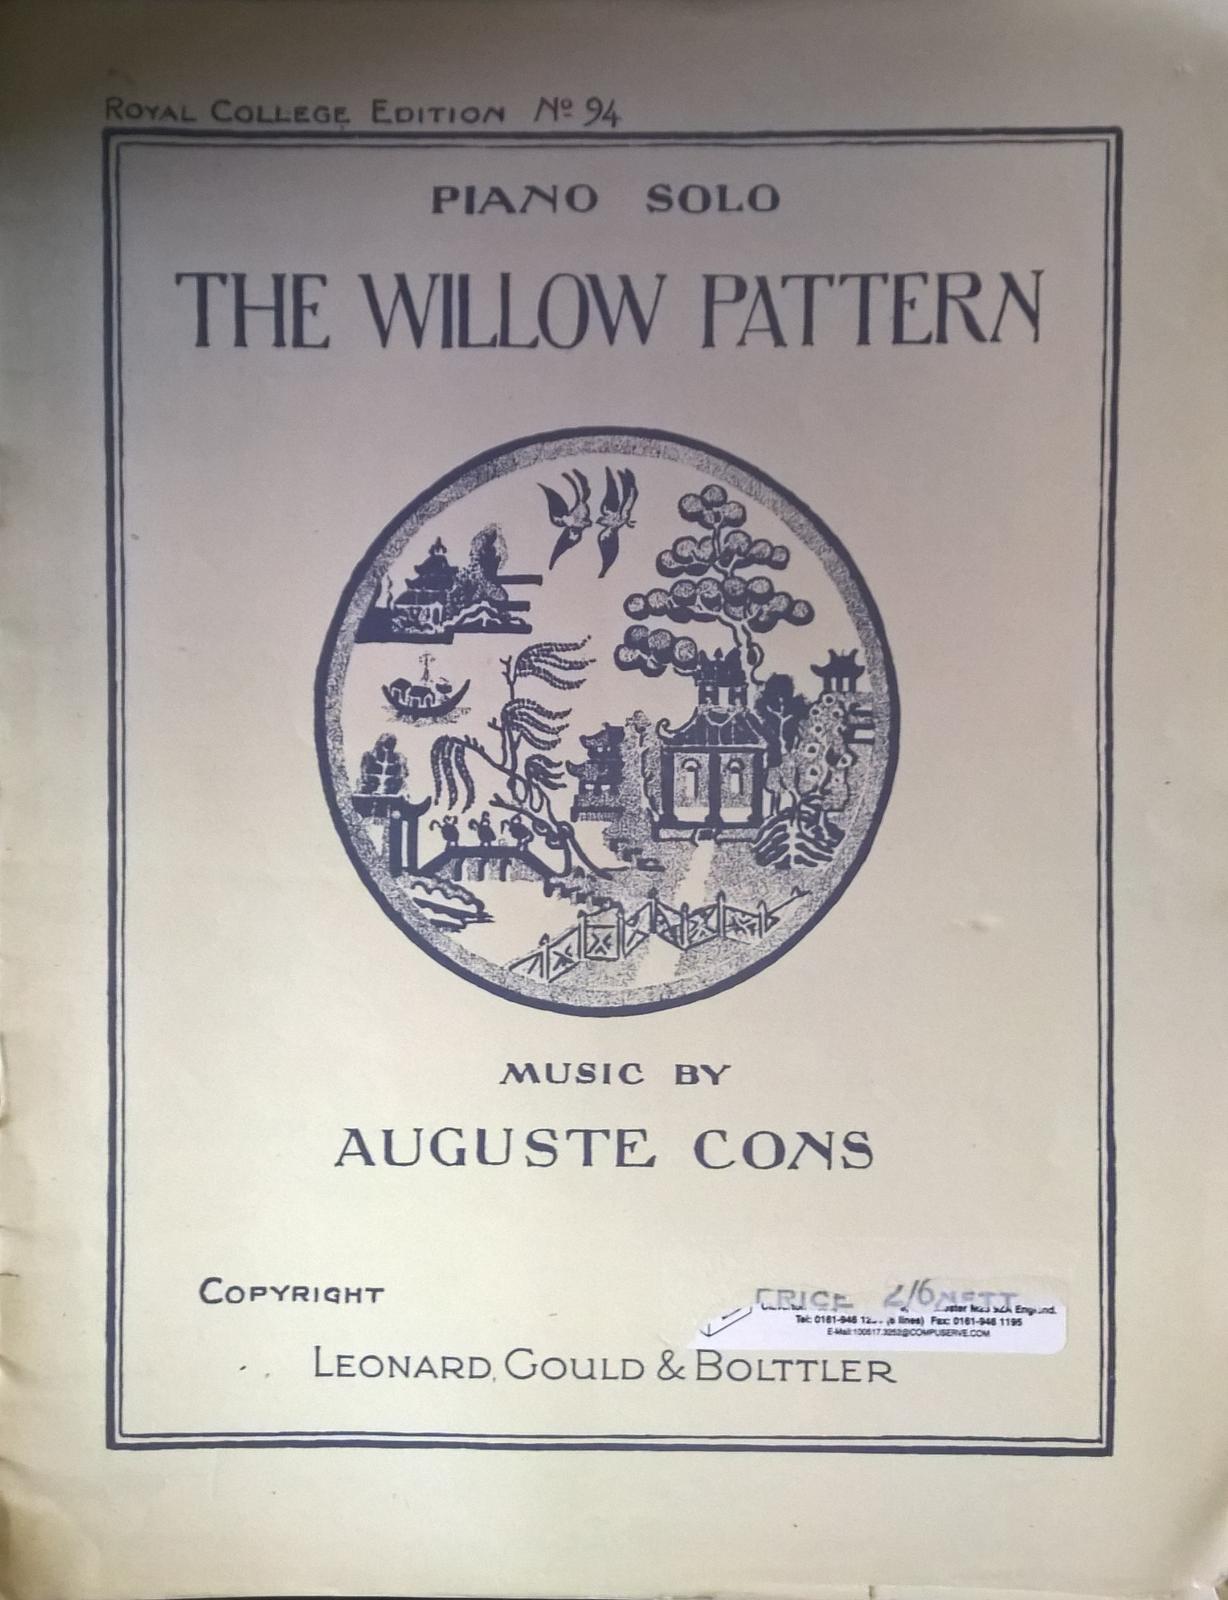 The Willow Pattern Suite de Ballet No 94 Piano Solo Auguste Cons Book S114